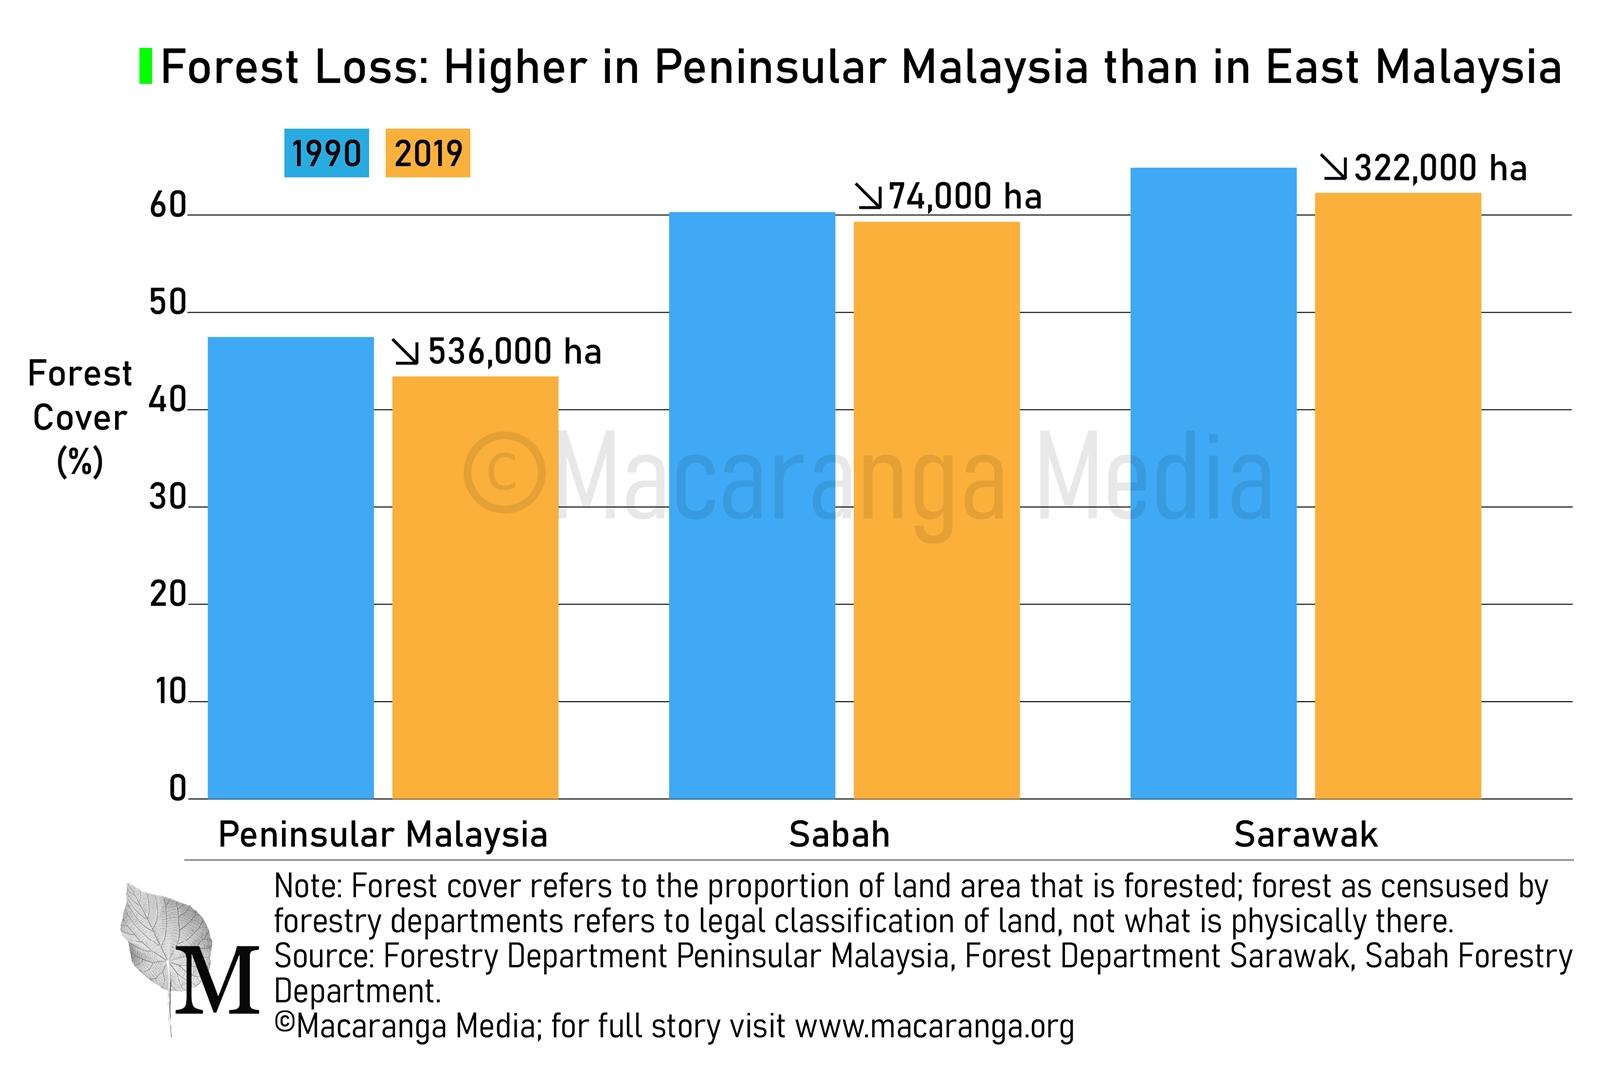 Figure 1: Forest Loss has been higher in Peninsular Malaysia than in East Malaysia (Macaranga)